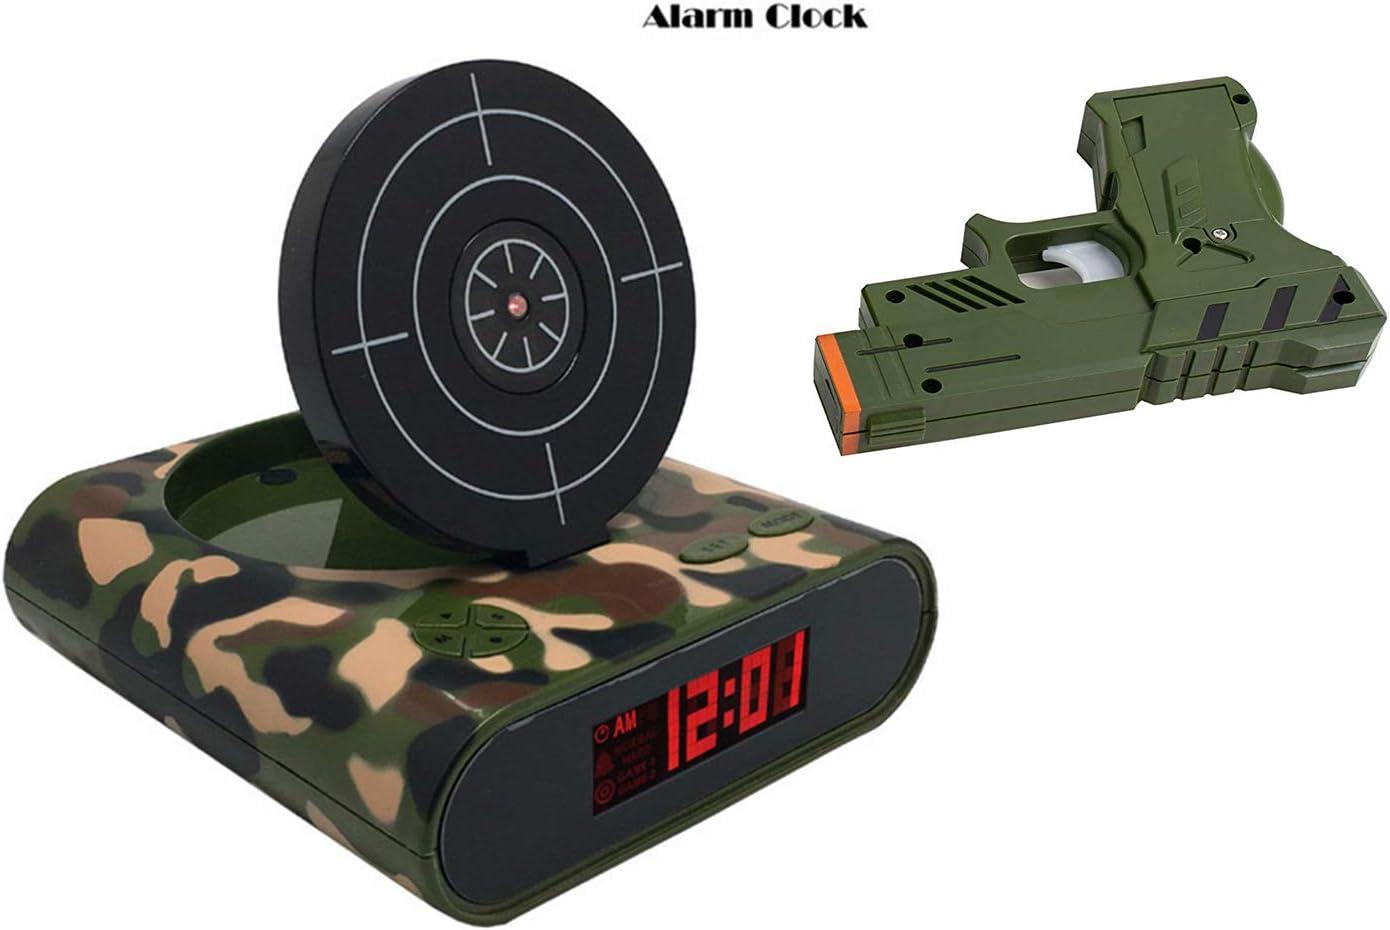 AYUMIGZM Pistola Reloj Despertador, Pantalla LED, Puerto USB, 12/24 Horas, Snooze, Camuflaje